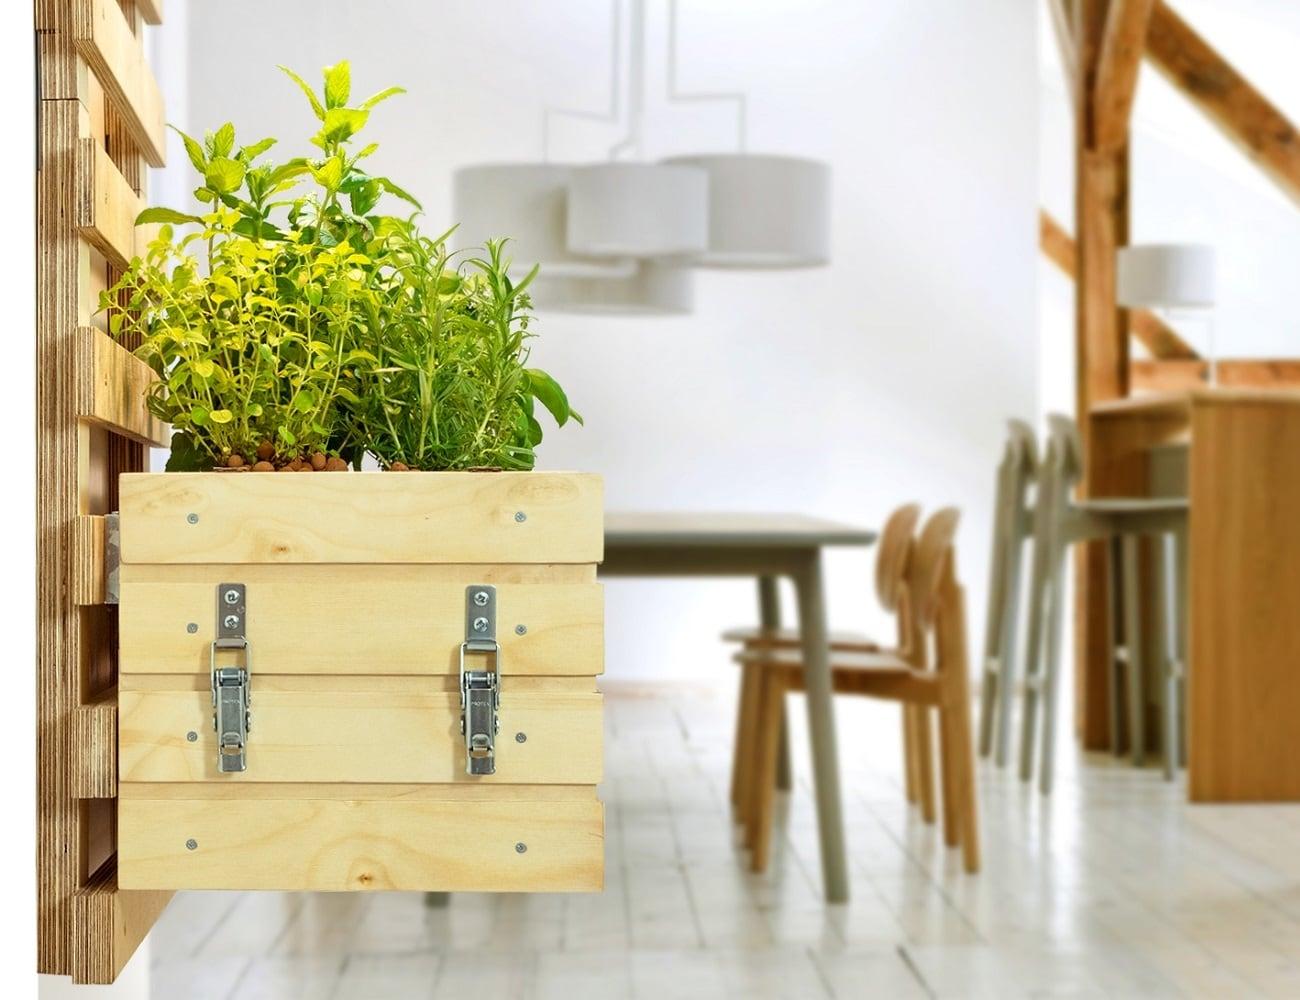 Gartenzwerg Smart Personal Gardens